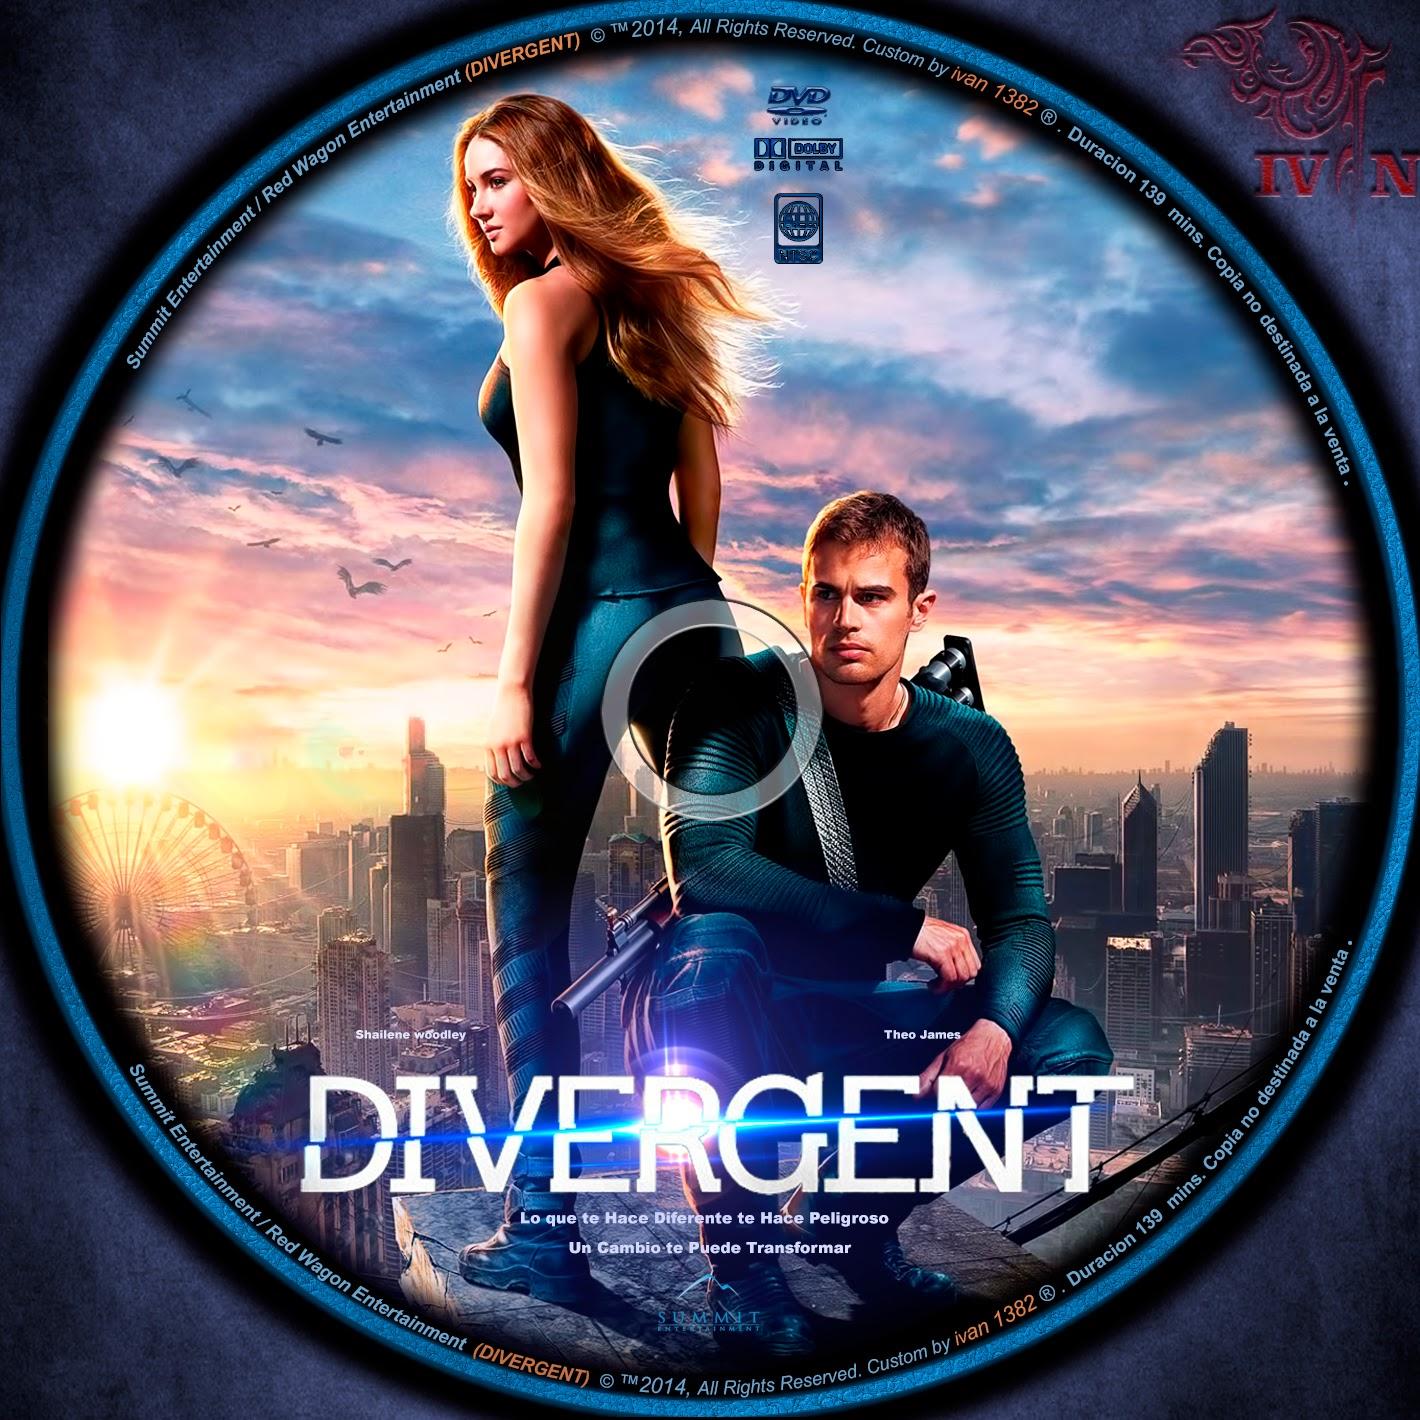 Divergent 2014 DVD COVER - CoverDvdGratis